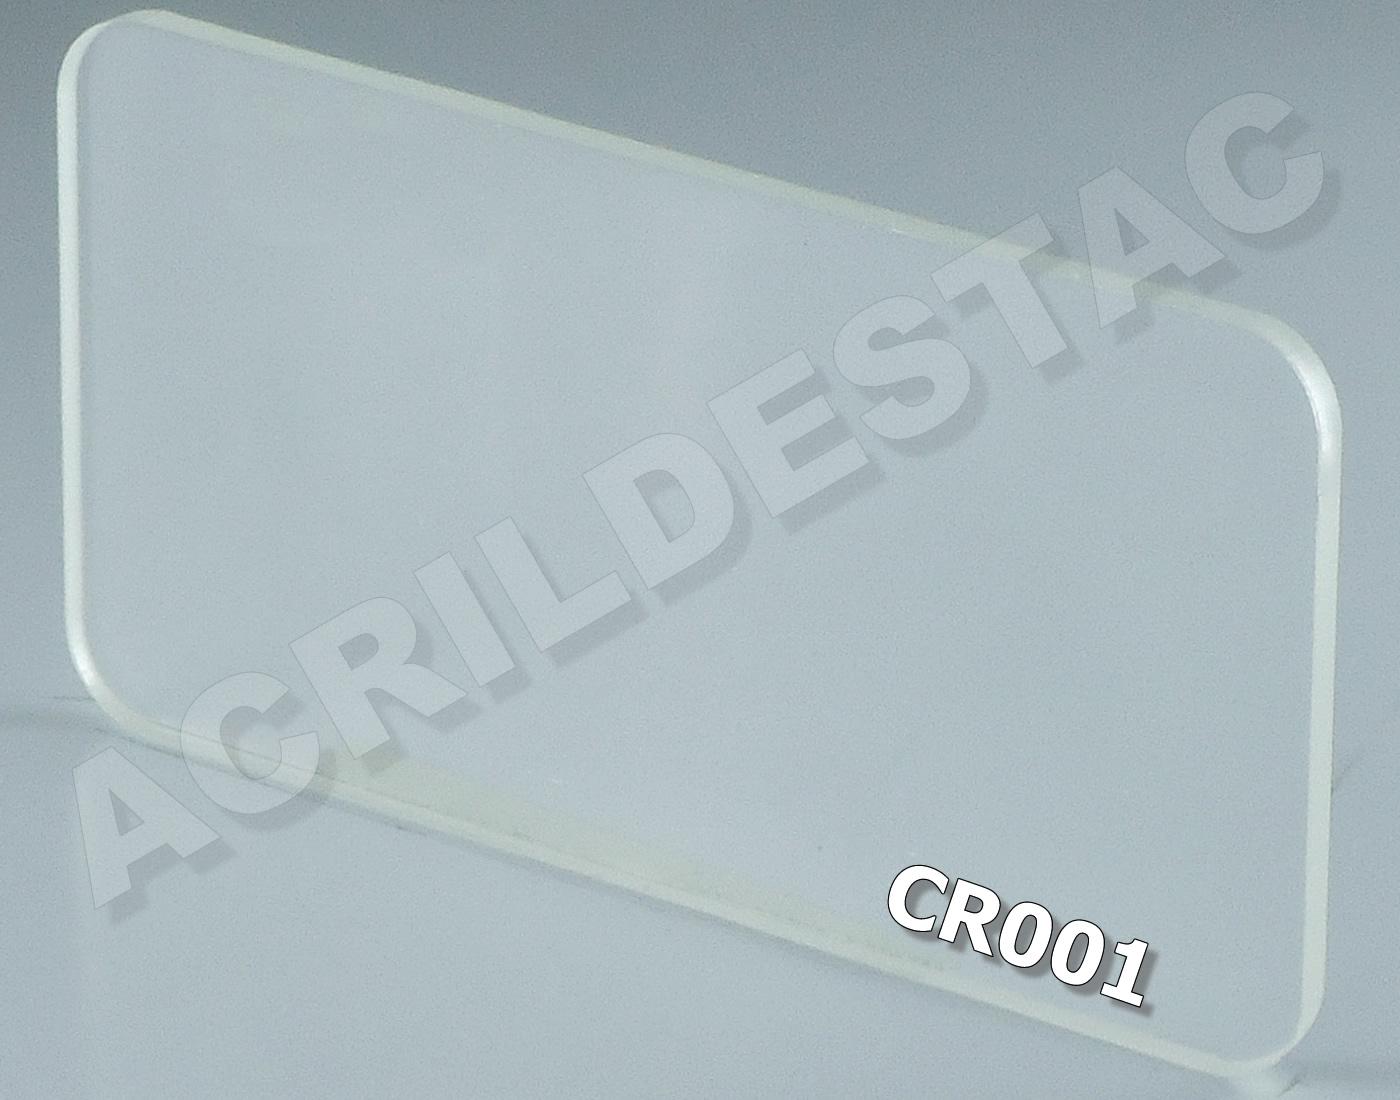 2 x 1 metro - 8mm - CRISTAL Transparente PL-CR001 -